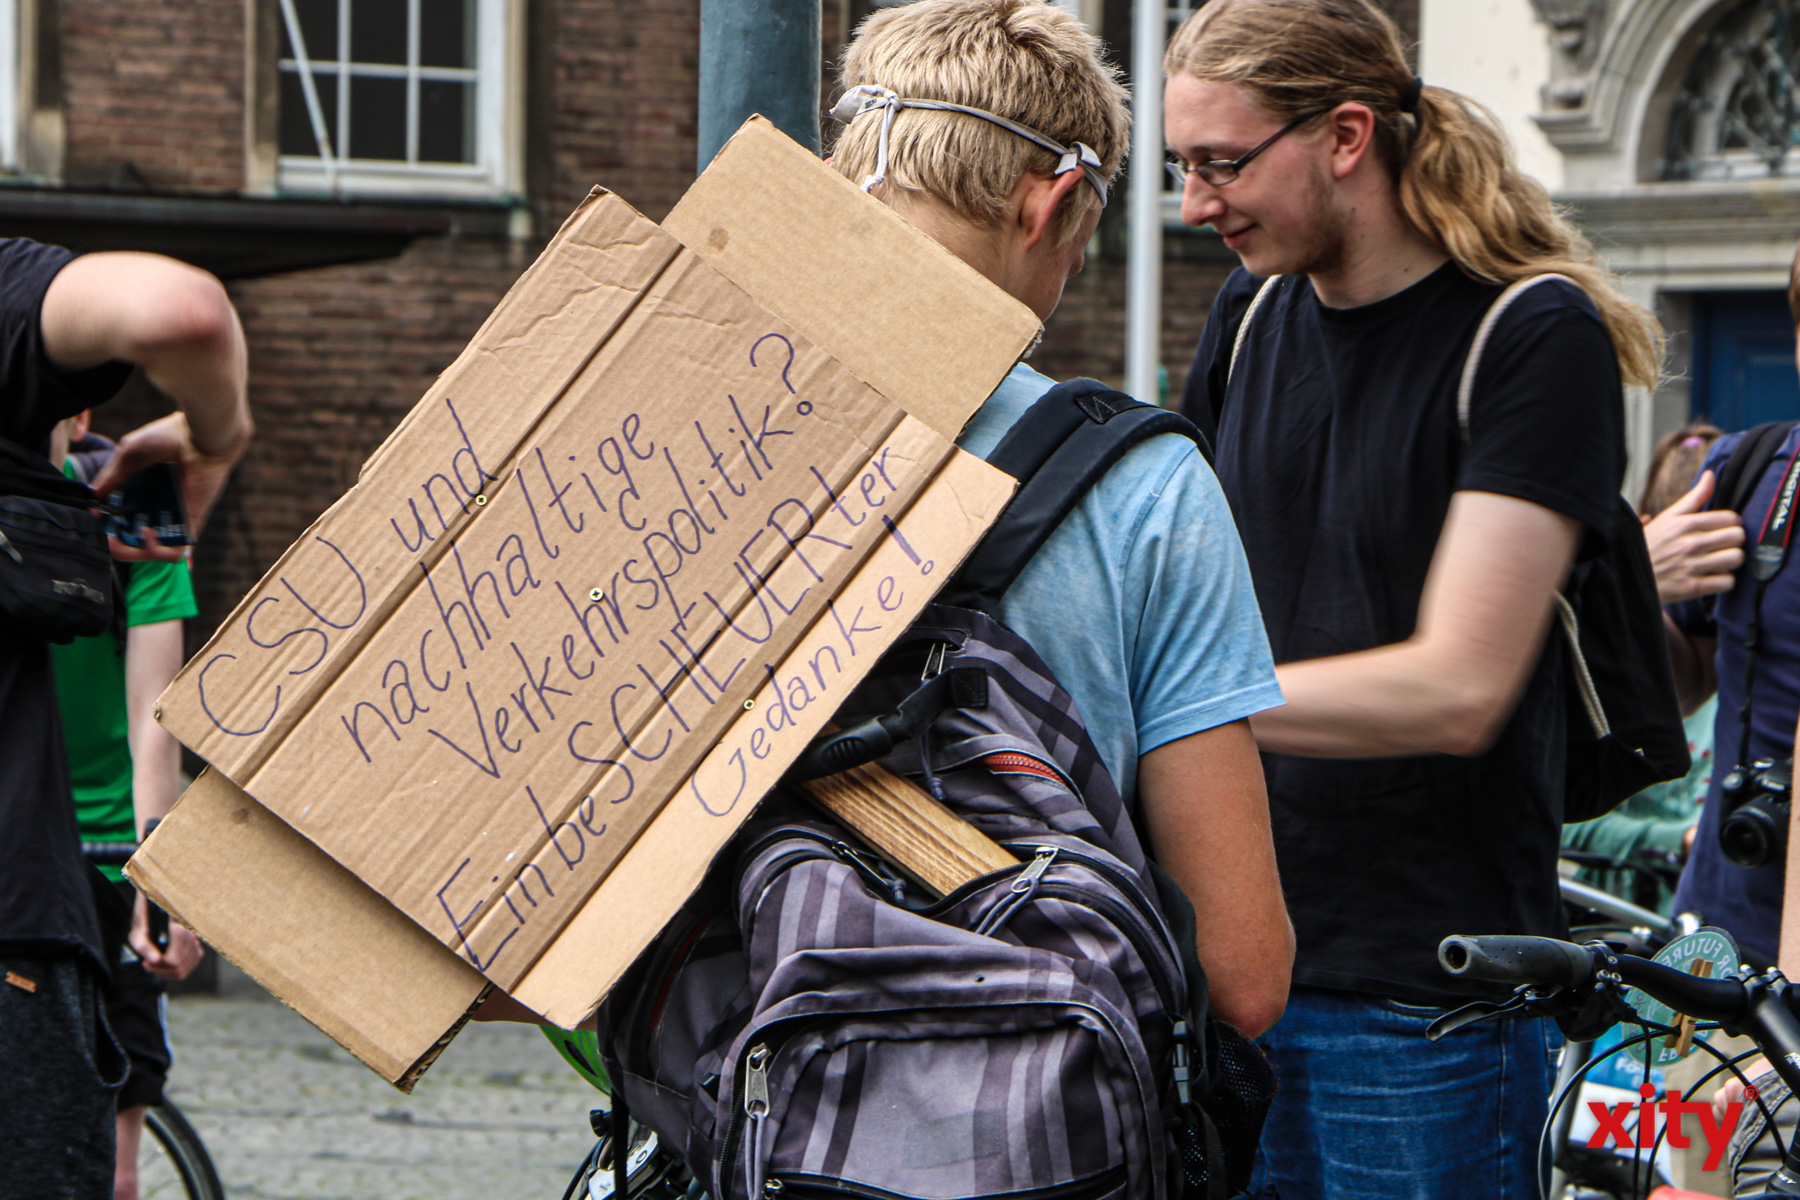 "Motto der Demo war: ""Fahrradweg, Auto weg - FahrRad for Future!"" (Foto: xity)"